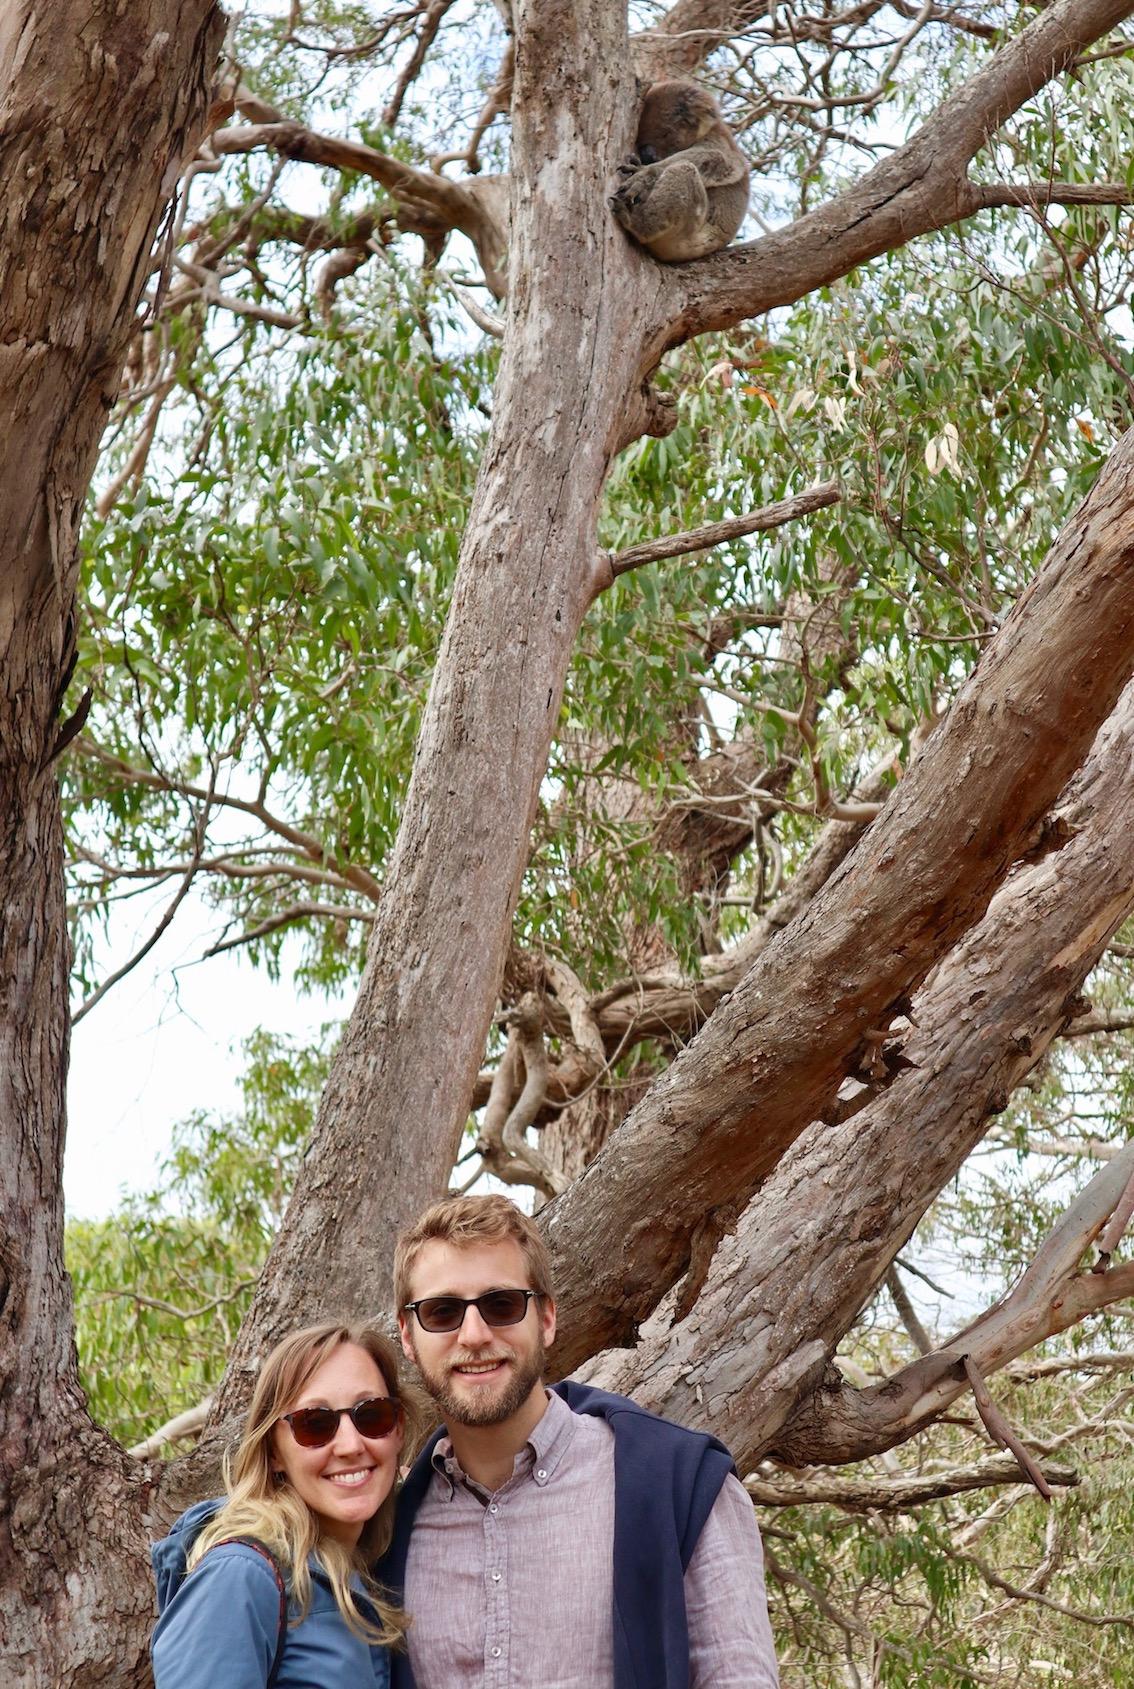 A Lovely Planet - Kangaroo Island